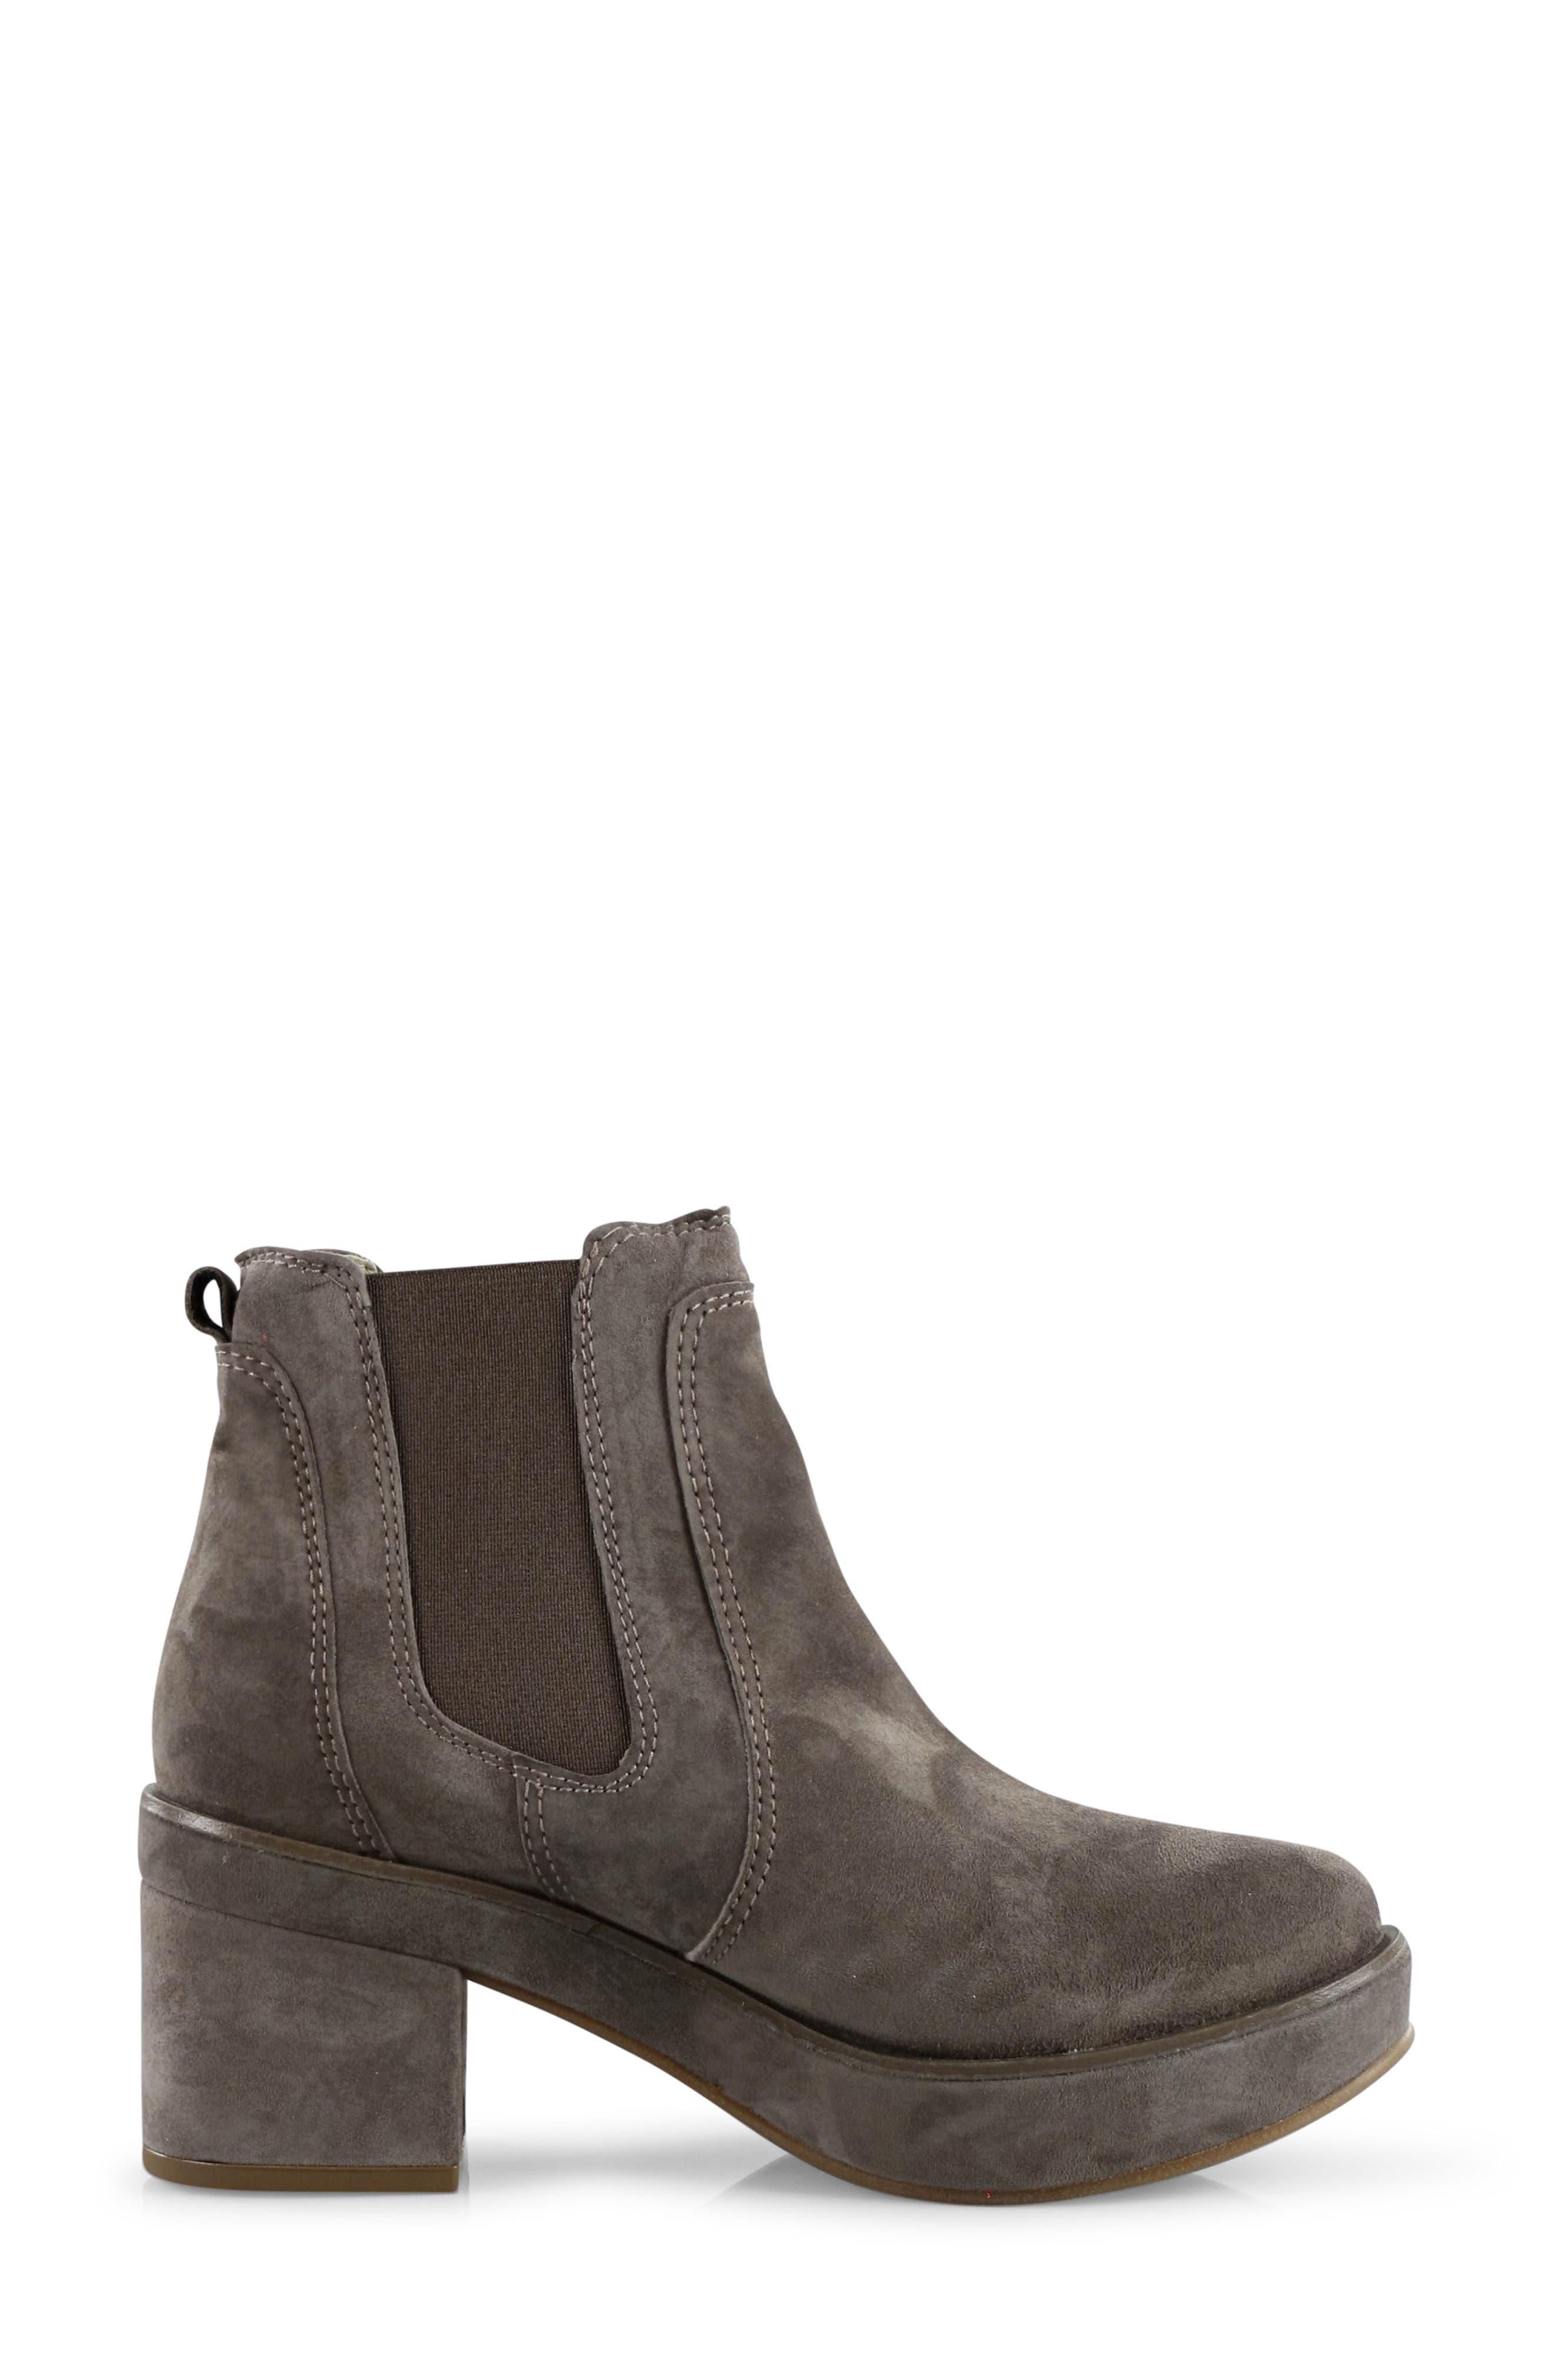 Alternate Image 3  - Klik Darli Platform Chelsea Boot (Women)